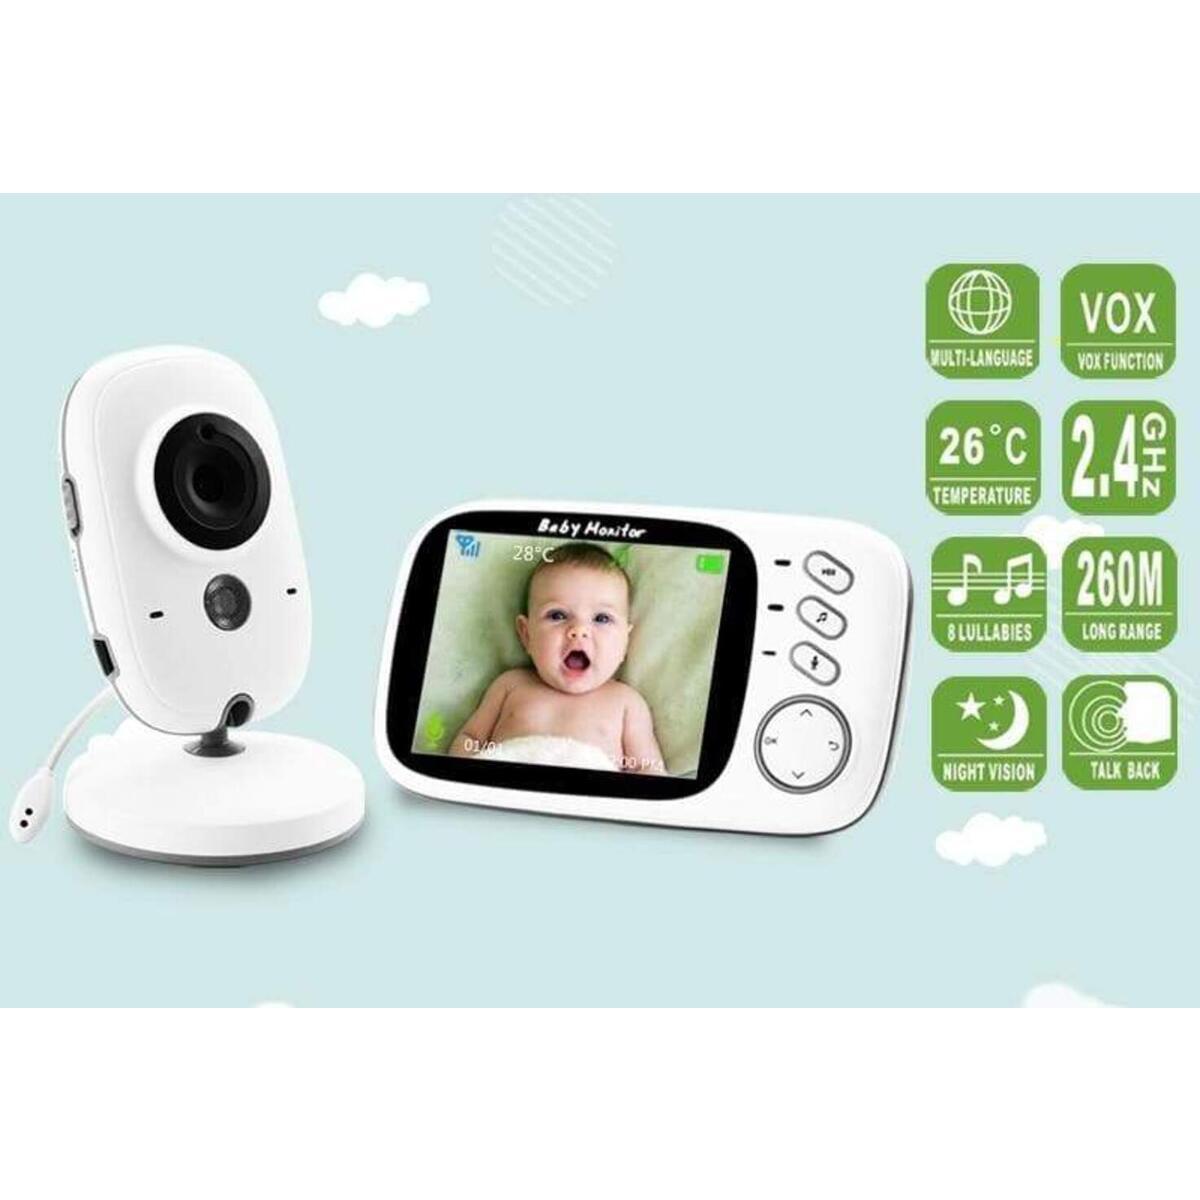 Video Baby Surveillance Monitor Wireless Camera ,LCD Digital Camera with Auto Infrared Night Vision, Power Saving, 2-Way Talk Back, Temperature Sensor Night Light, LCD Display, Lullabies